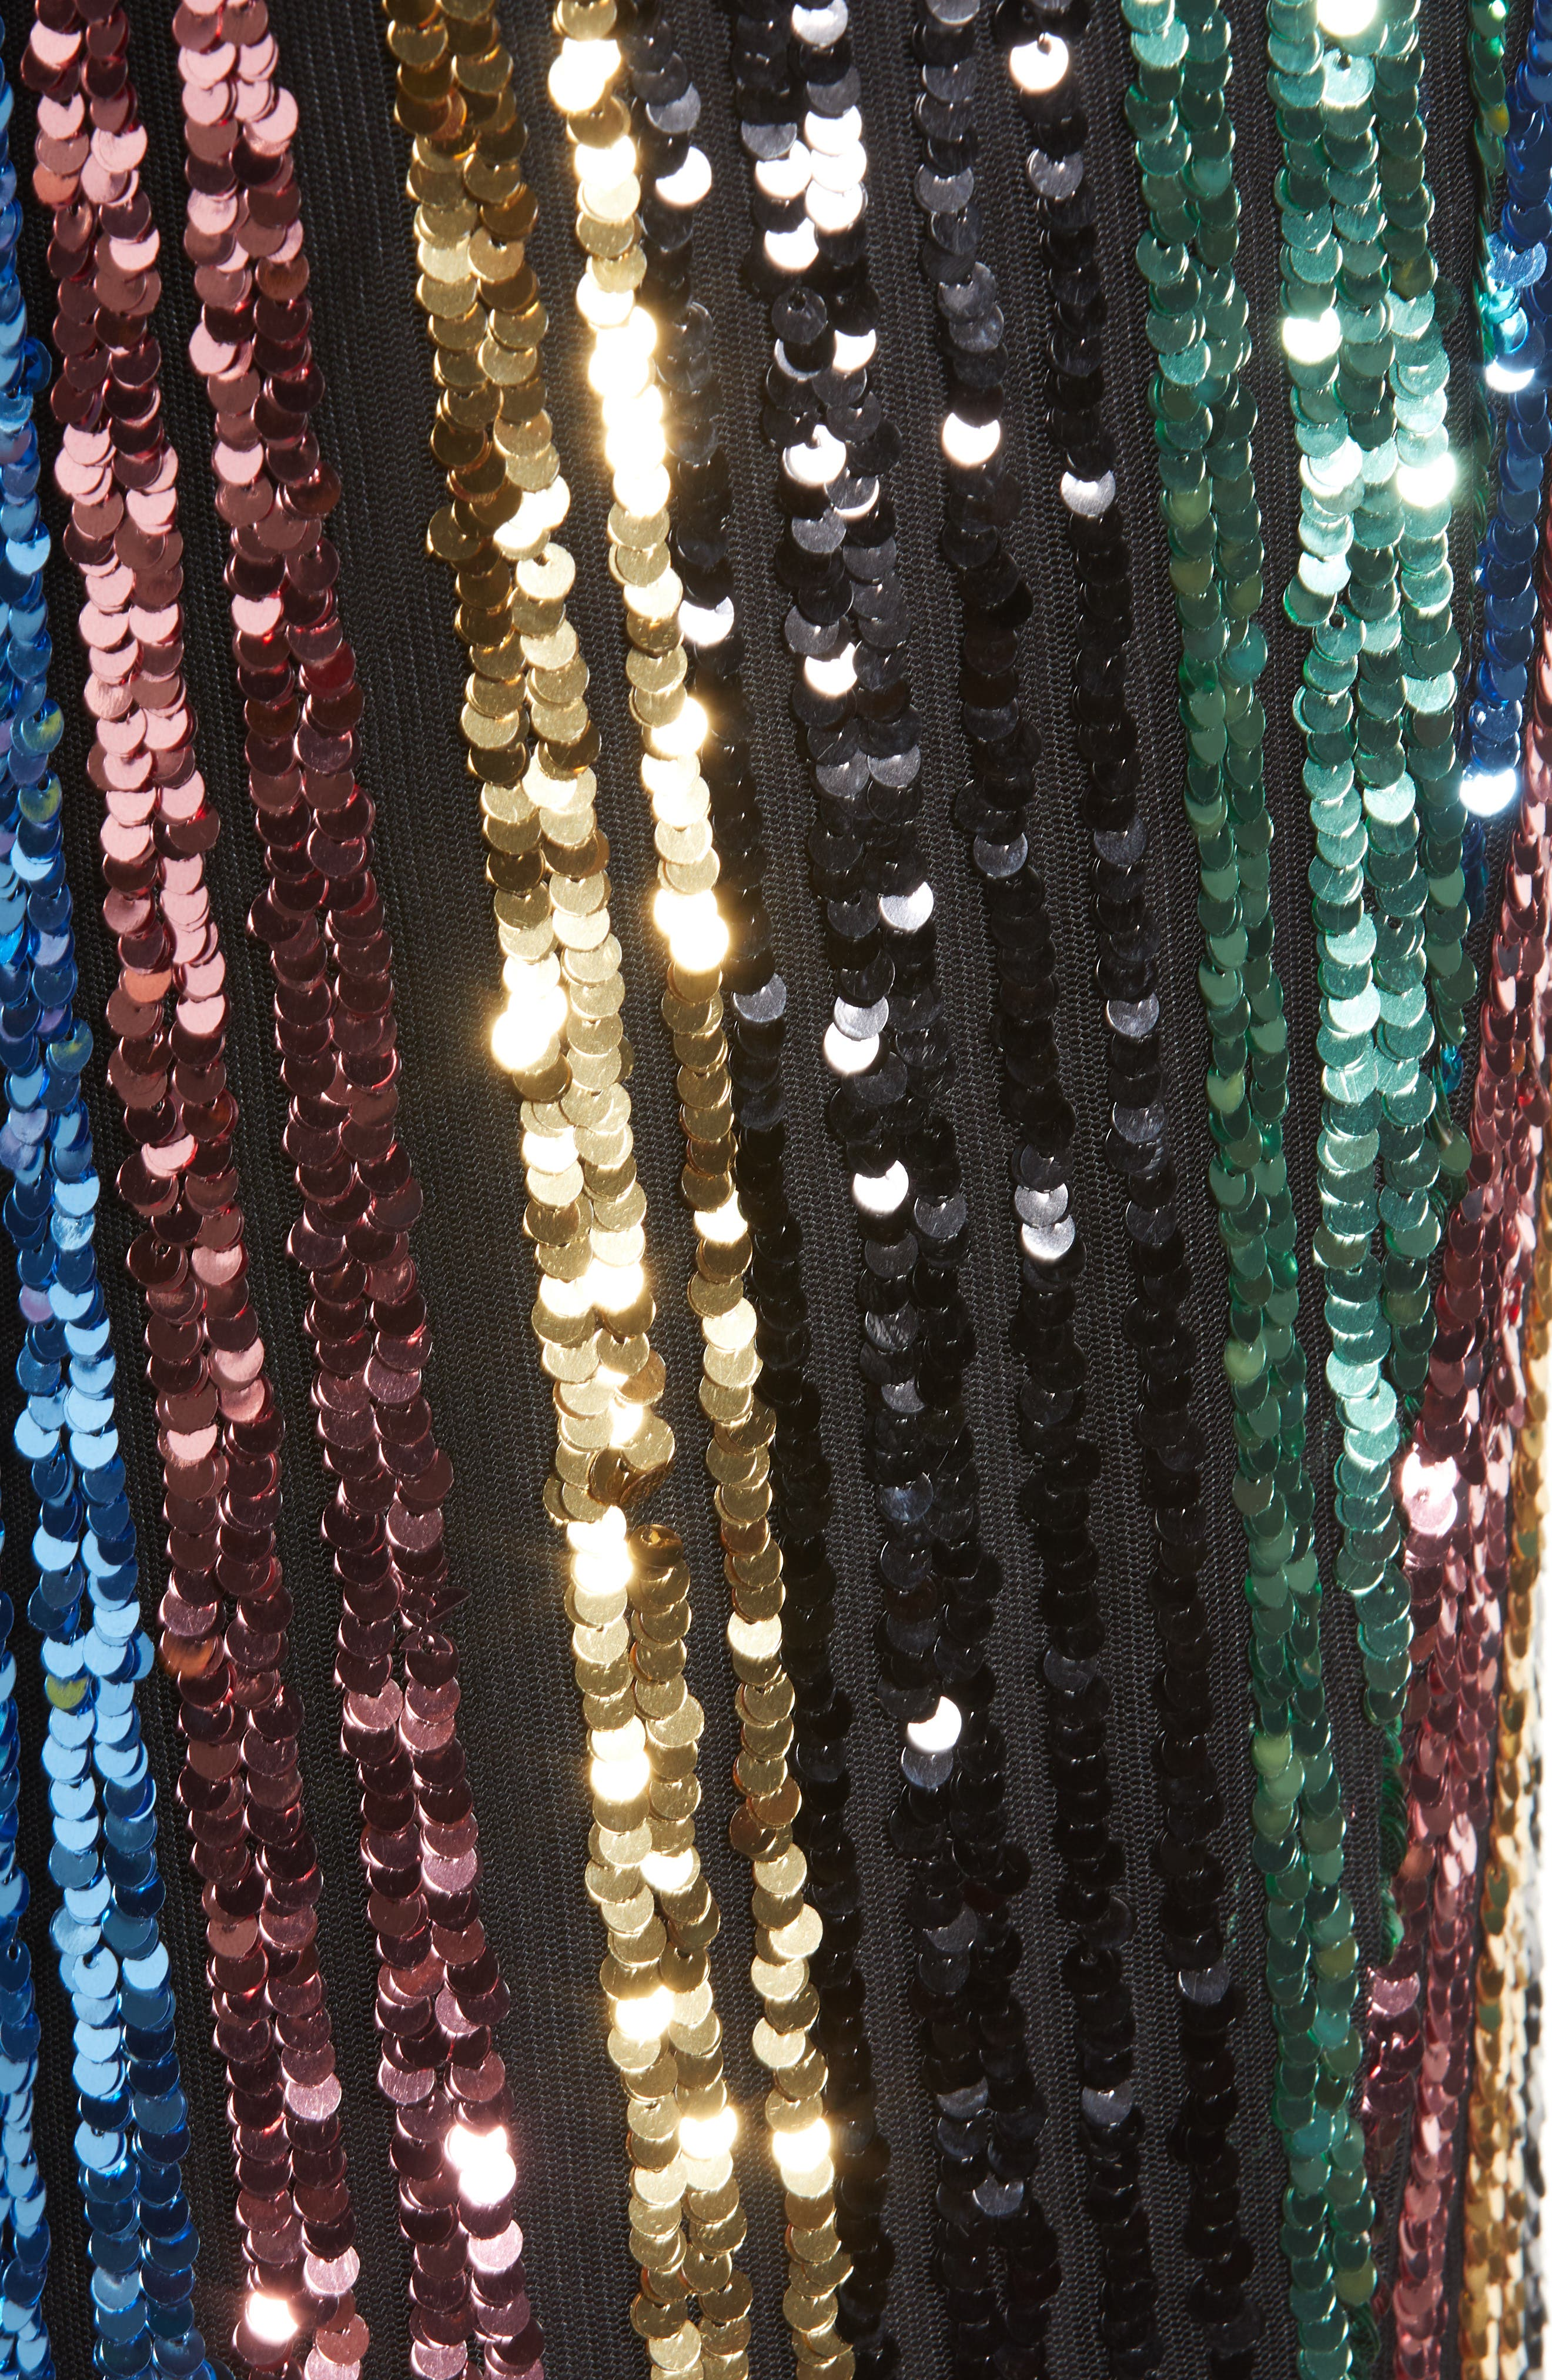 Leigh High Waist Sequin Stripe Pants,                             Alternate thumbnail 6, color,                             COCKTAIL STRIPE SEQUINS